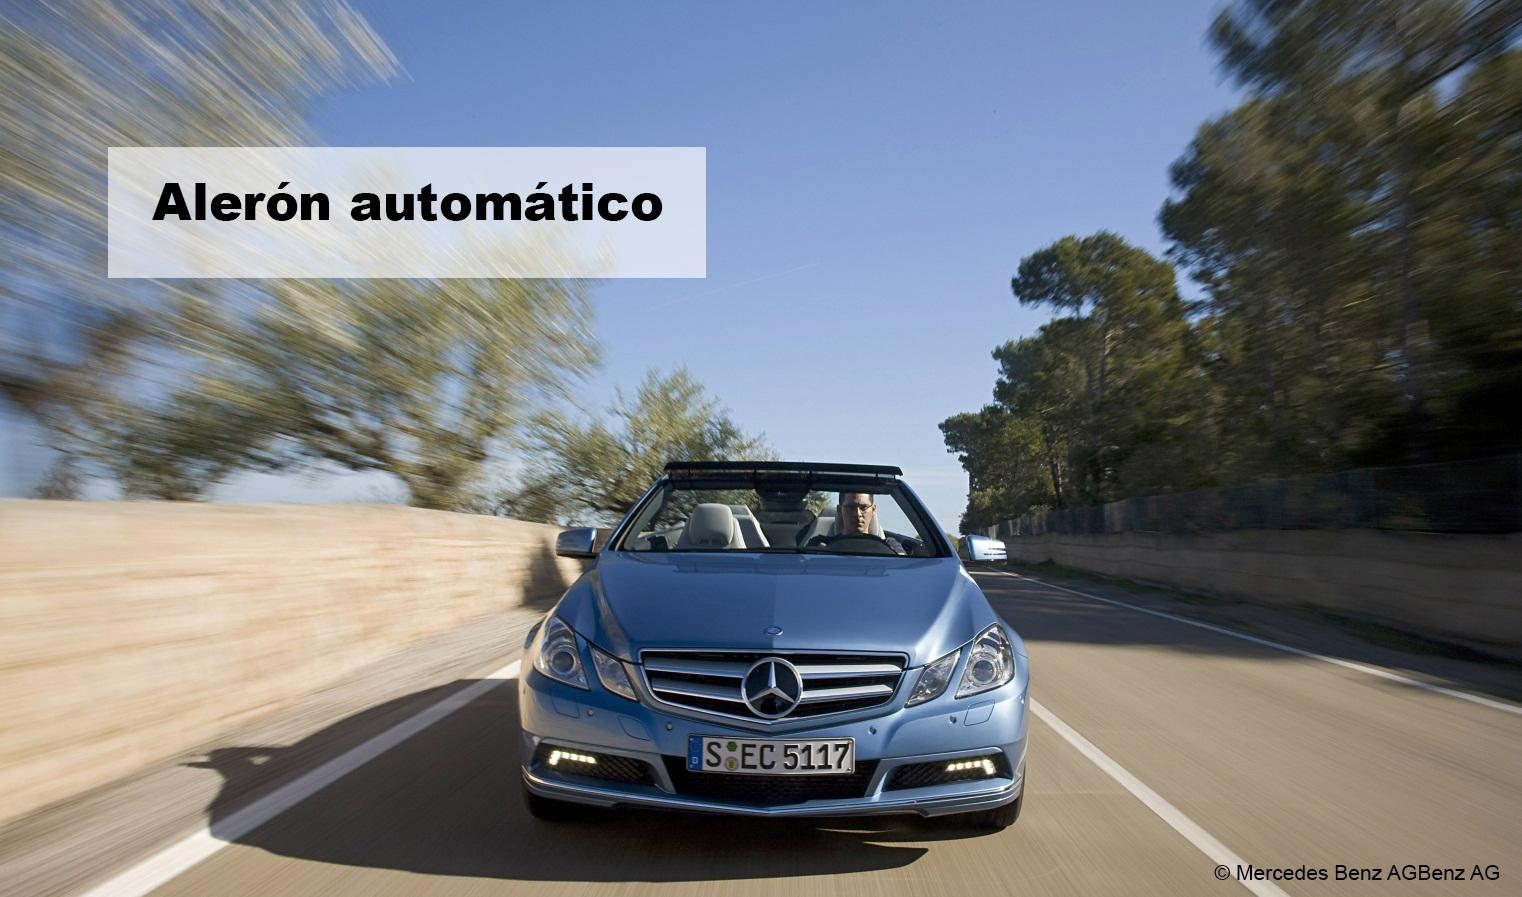 motor-dc-aleron-automatico-mercedes-benz